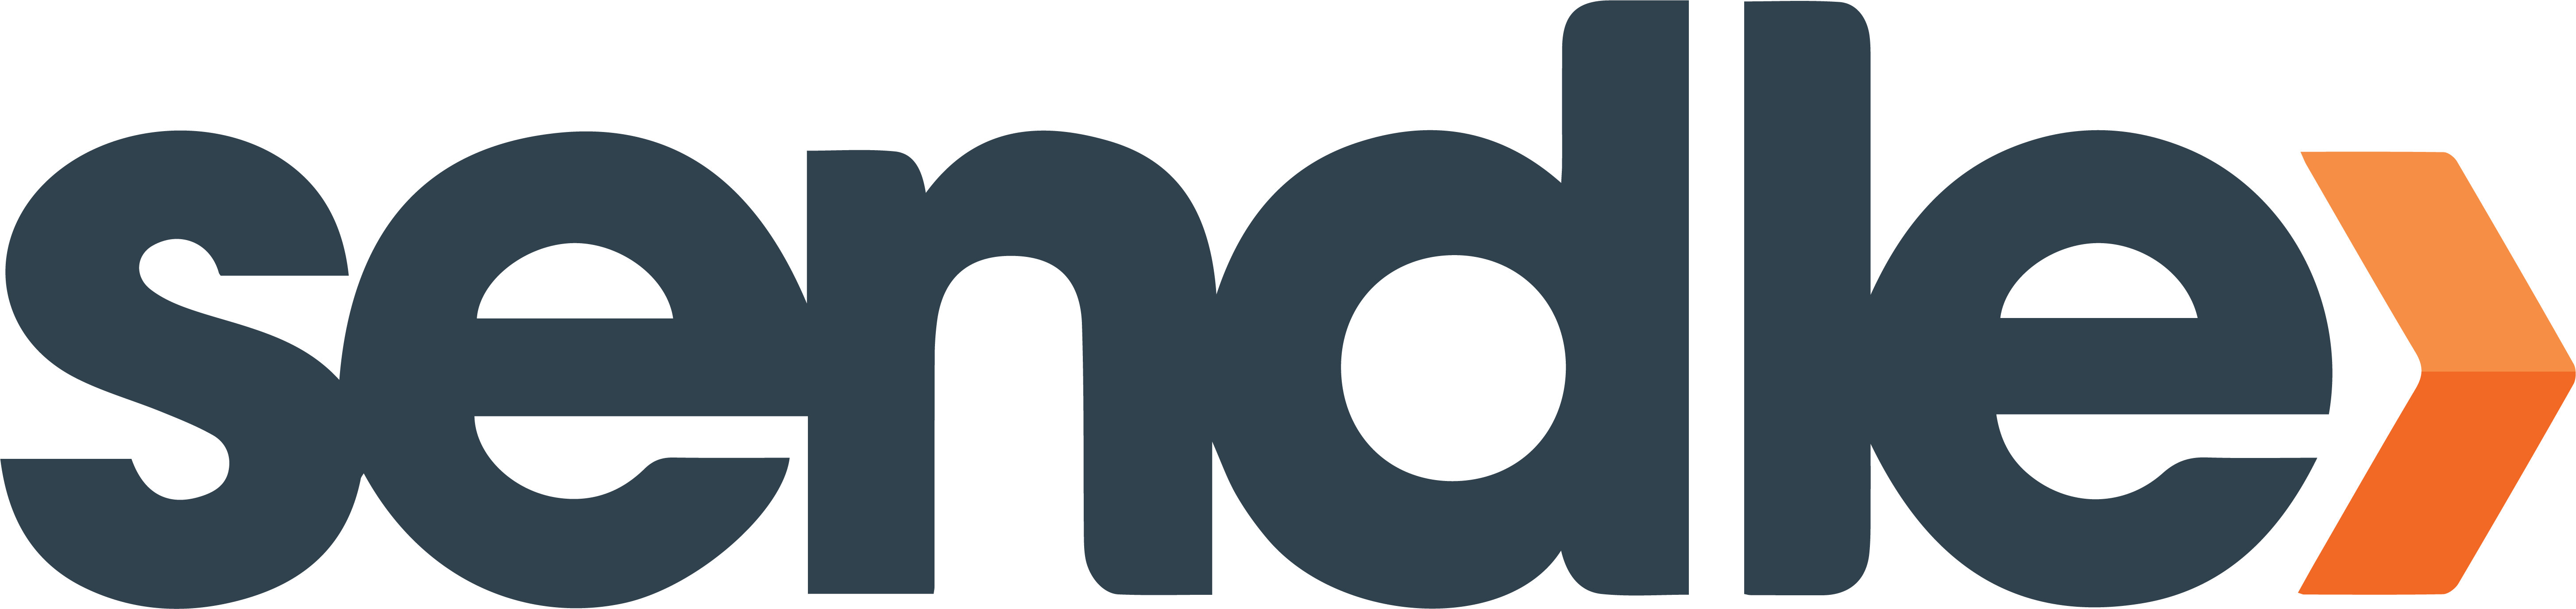 Sendle